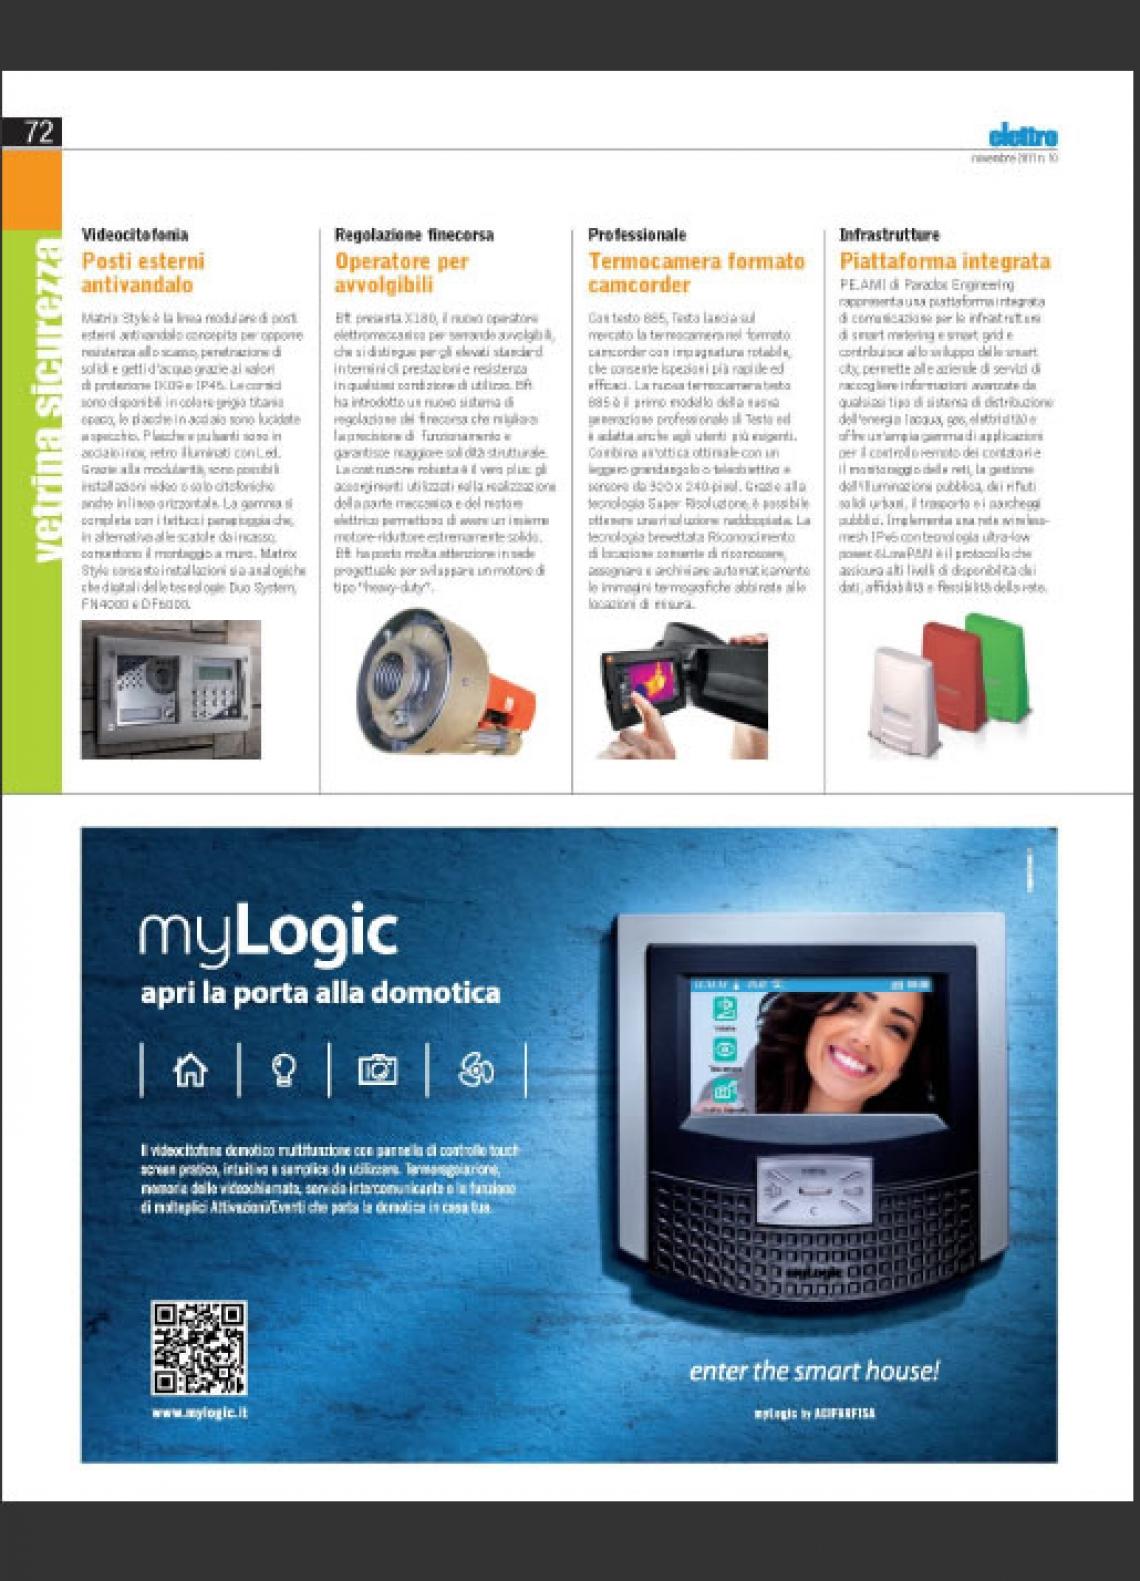 Videocitofono domotico myLogic